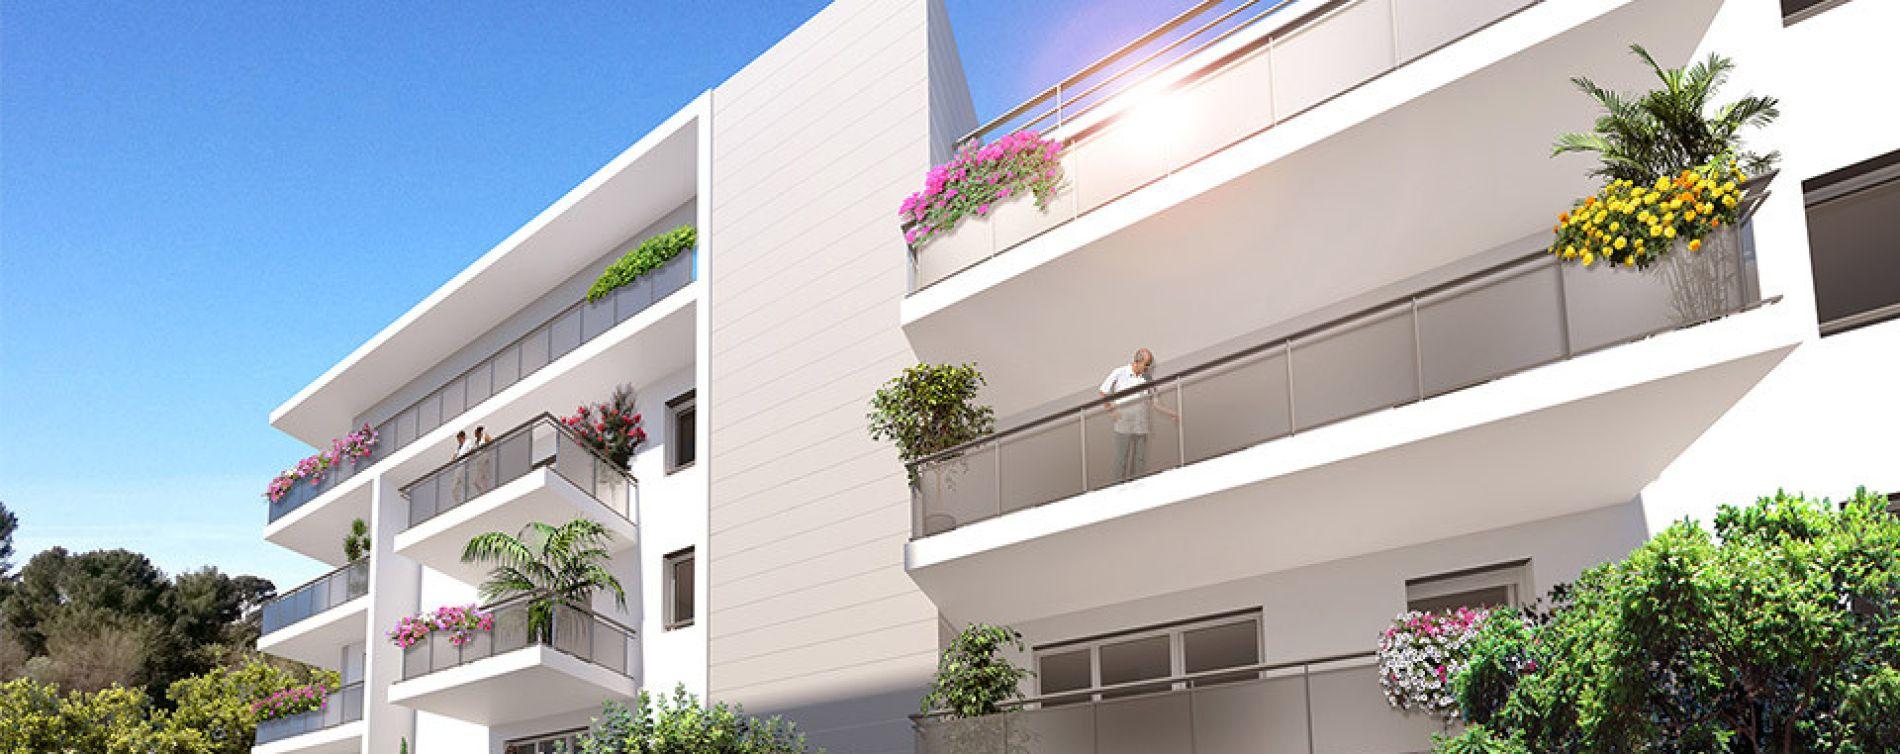 avant sc ne roquevaire programme immobilier neuf n 214890. Black Bedroom Furniture Sets. Home Design Ideas